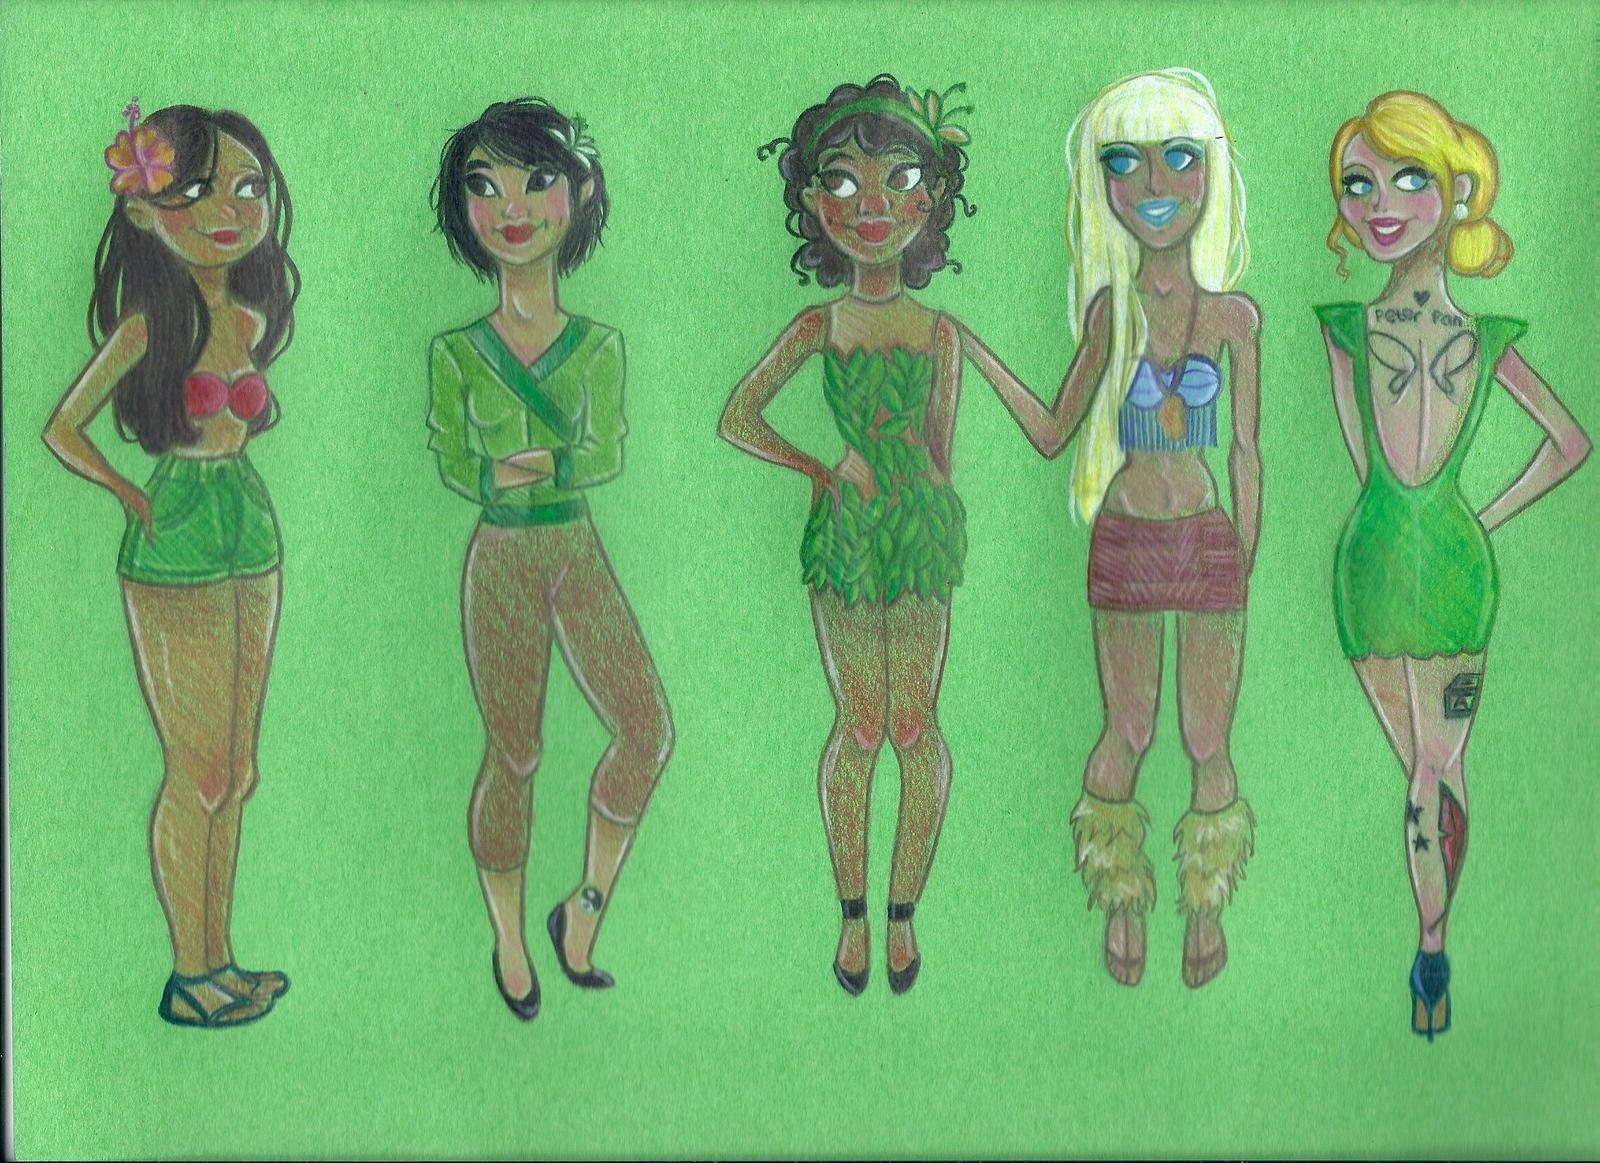 Modern disney princesses 3 by joshbeames on deviantart